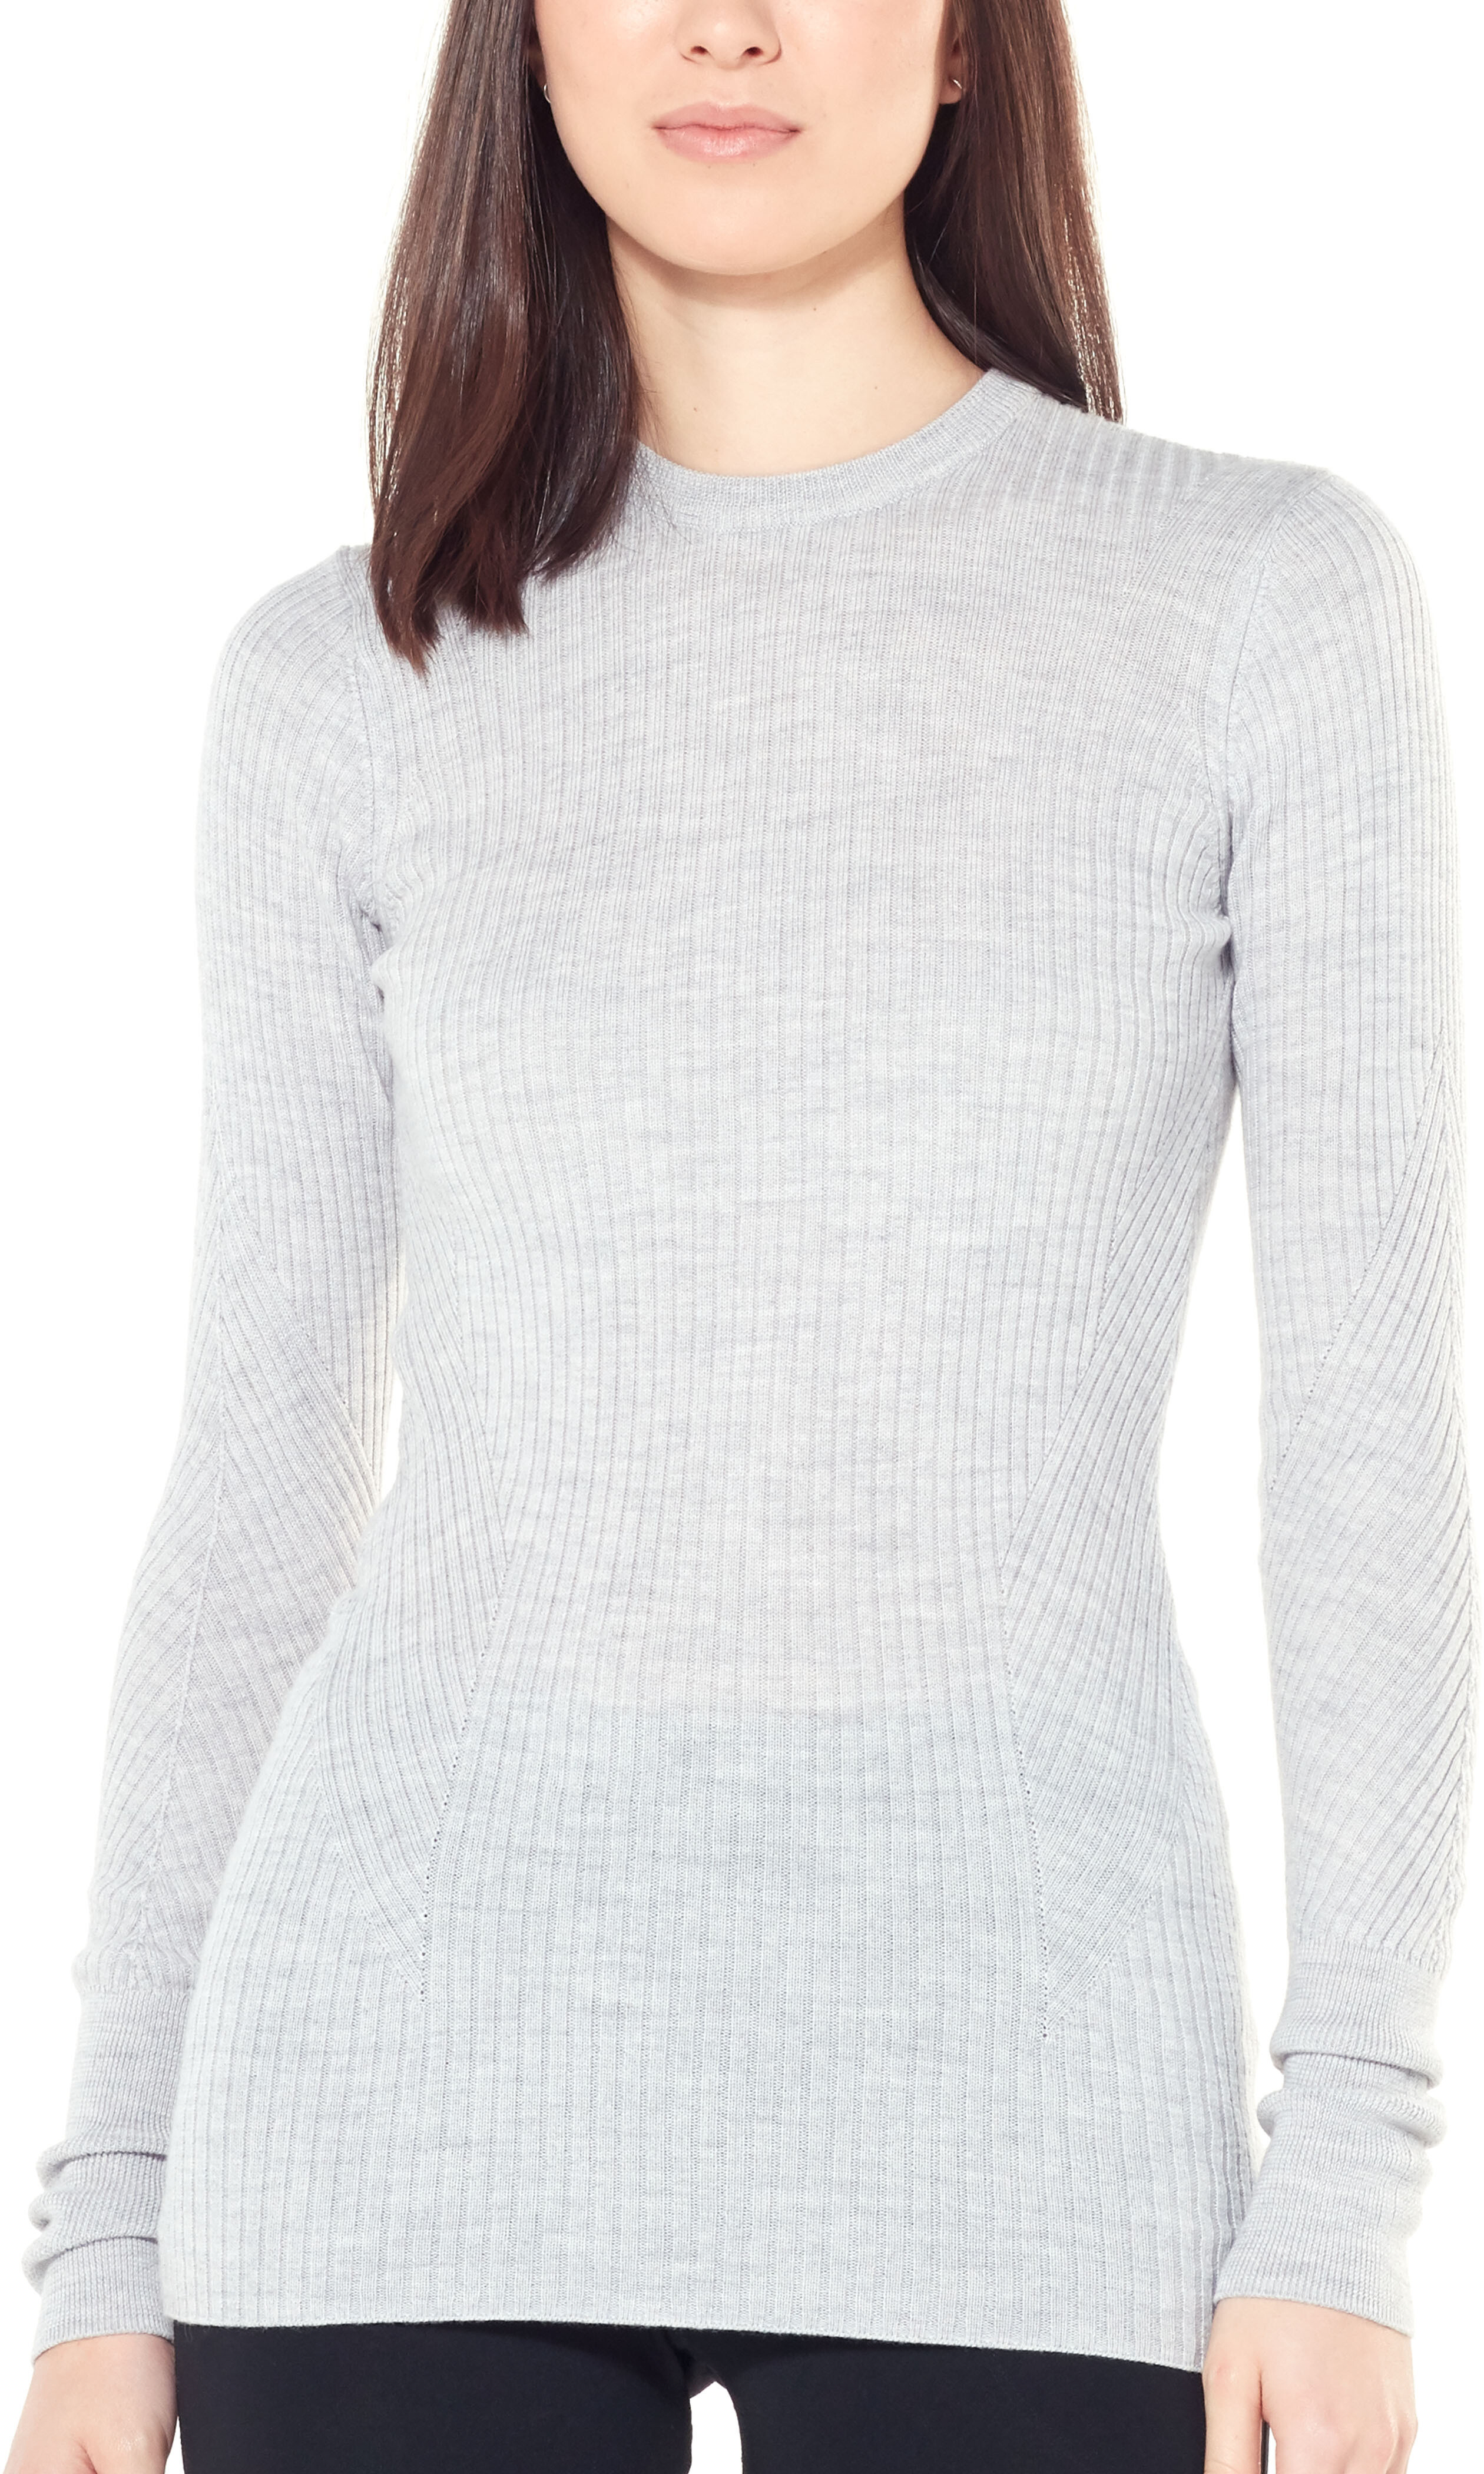 849ba7cfdb1 Icebreaker Womens Valley Slim Crewe Sweater Steel Heather